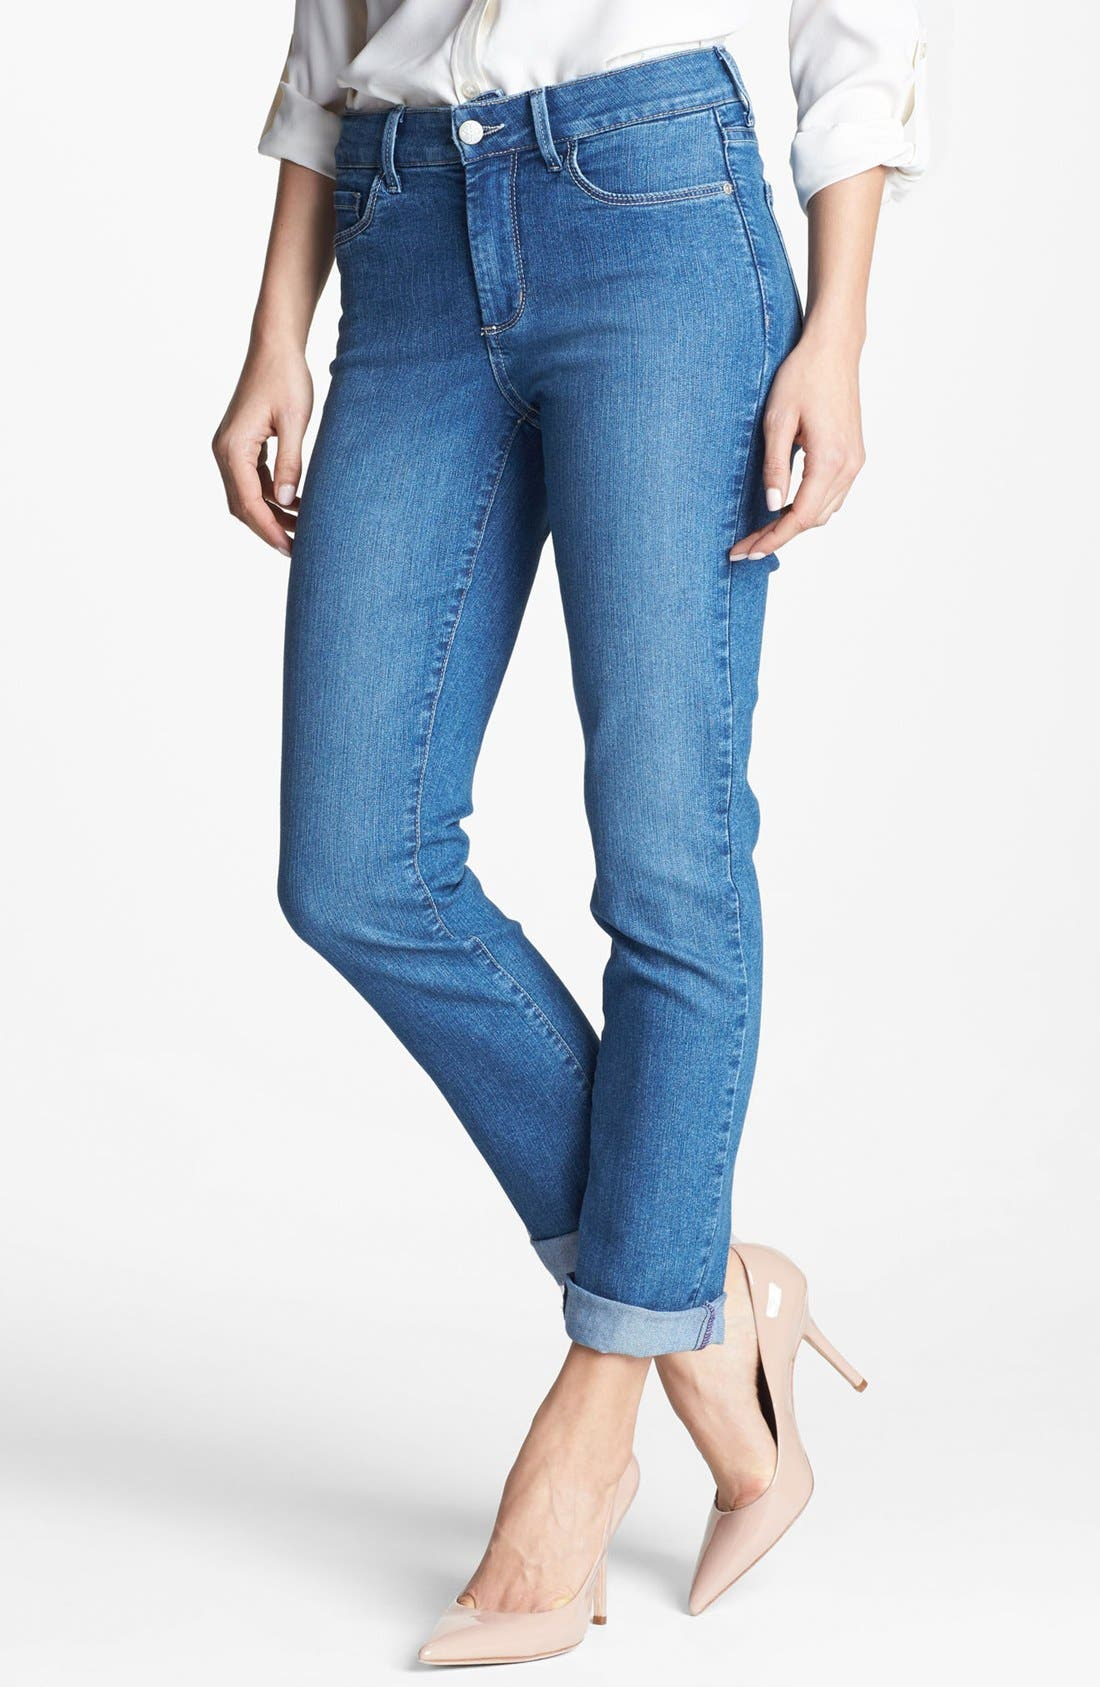 Main Image - NYDJ 'Tanya' Cuffed Stretch Boyfriend Jeans